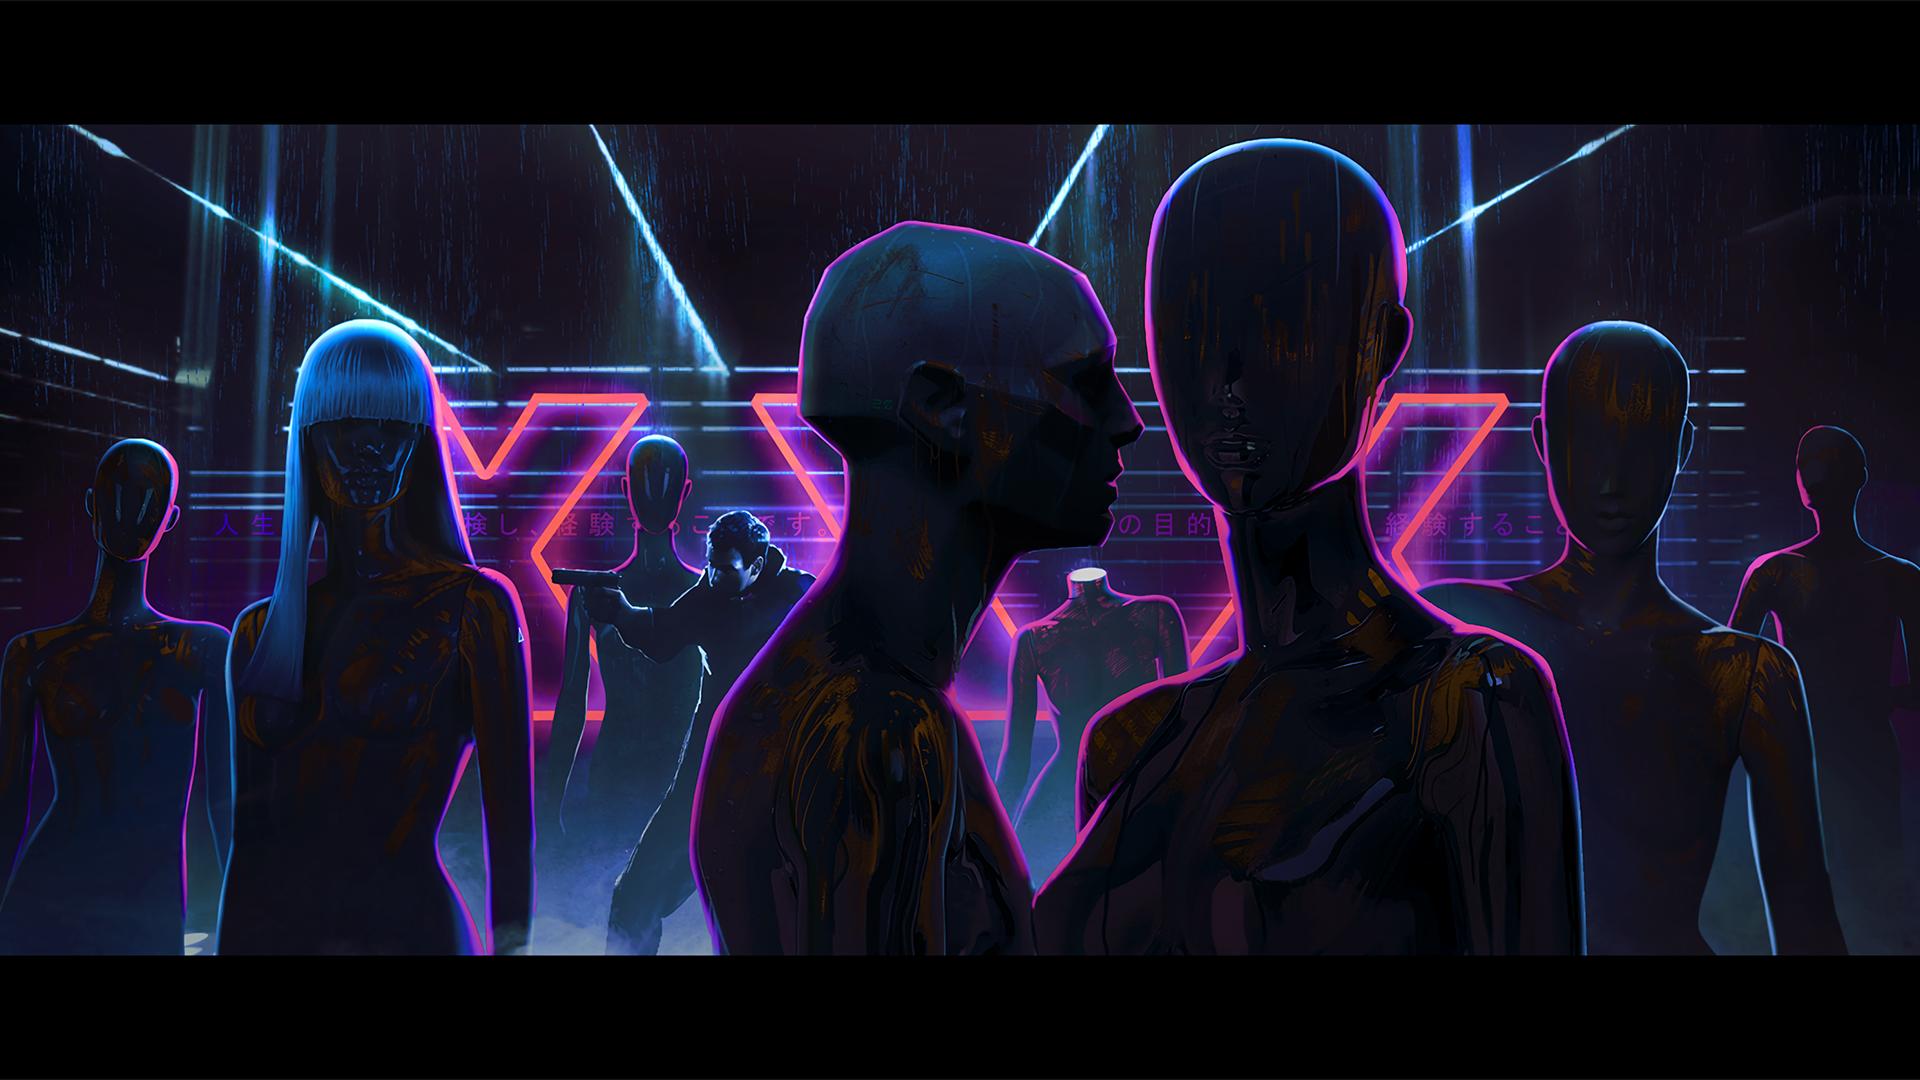 General 1920x1080 digital art neon futuristic cyber